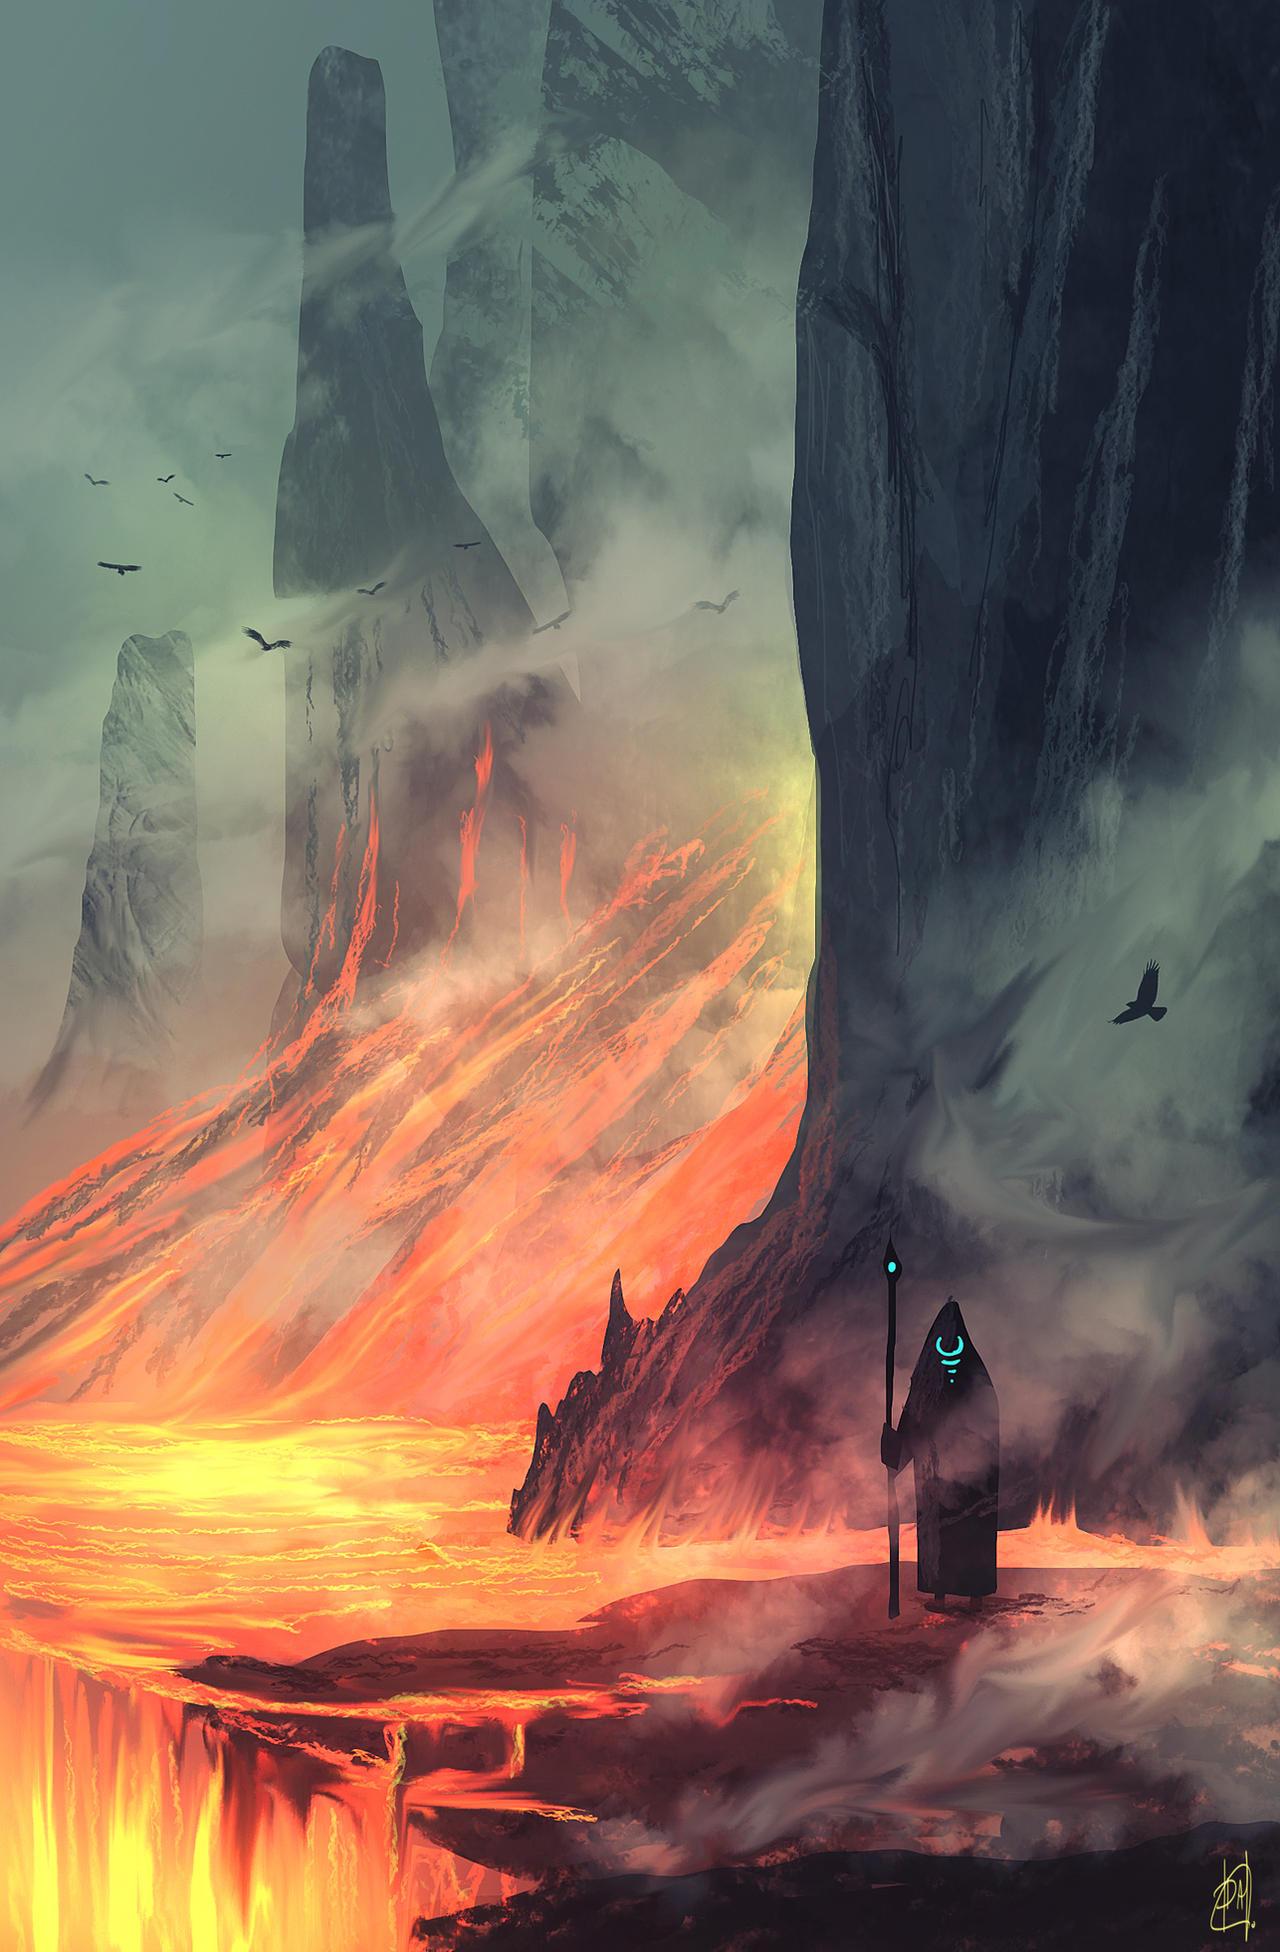 daily speedpaint 128 - sea of lava #2 by iDaisan